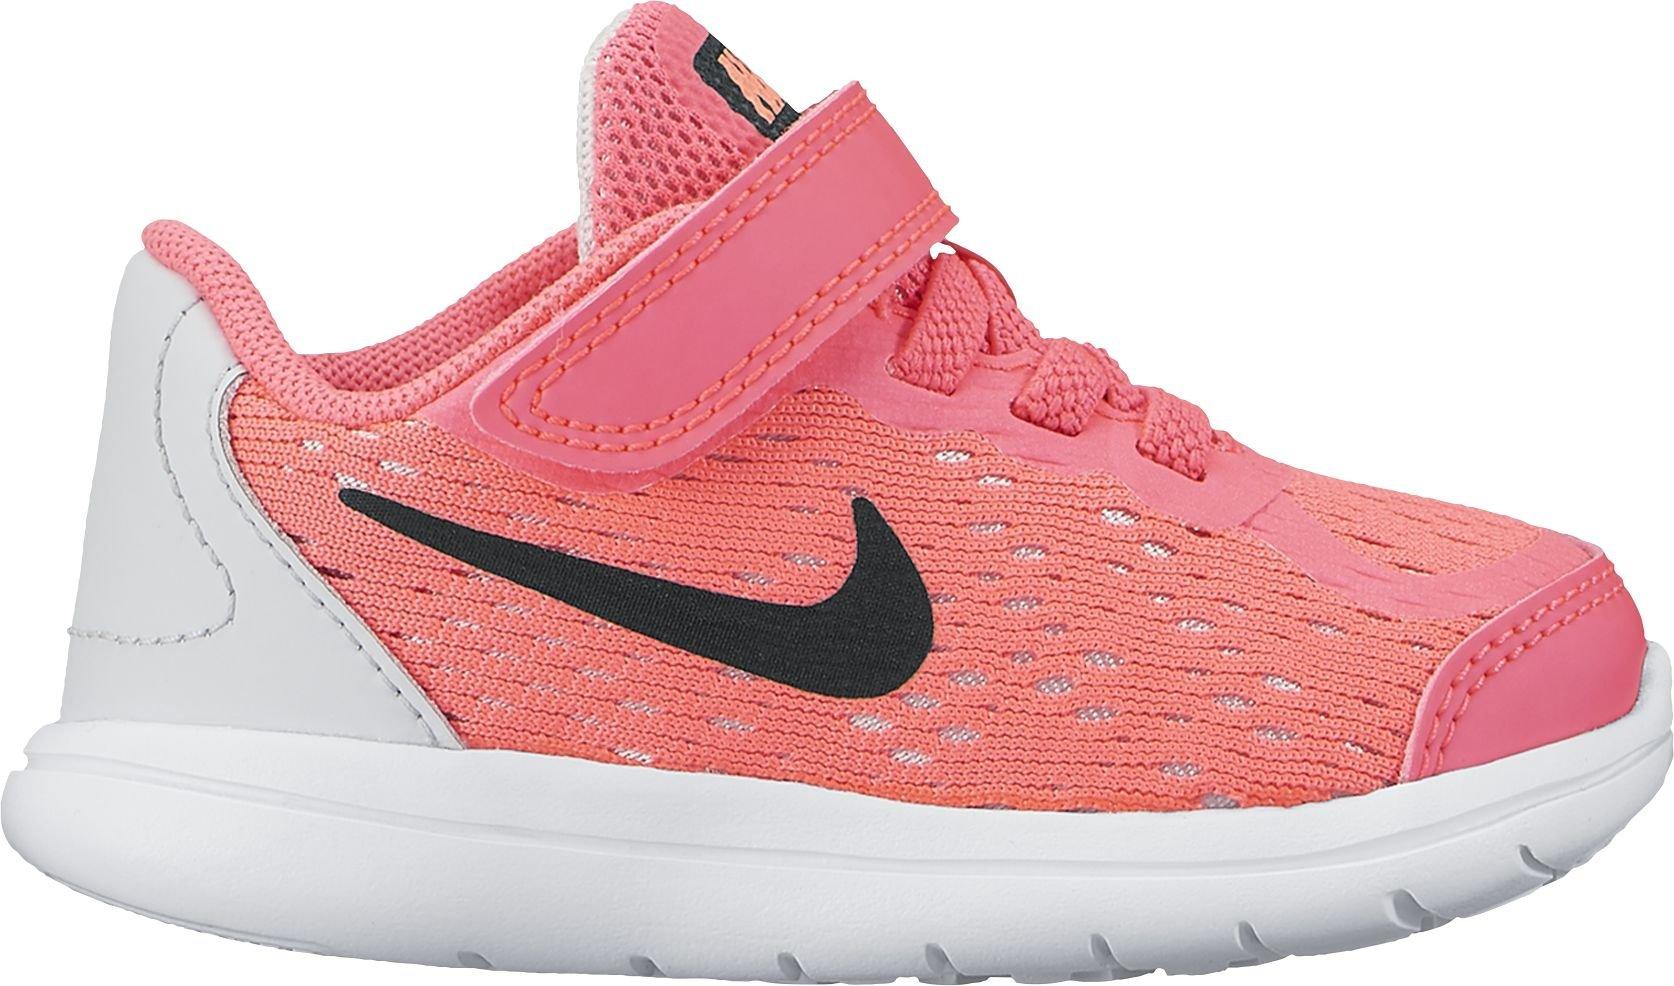 a5f68fa9b67c3 Nike Girl s Flex RN 2017 (TDV) Toddler Shoe Racer Pink Black Pure